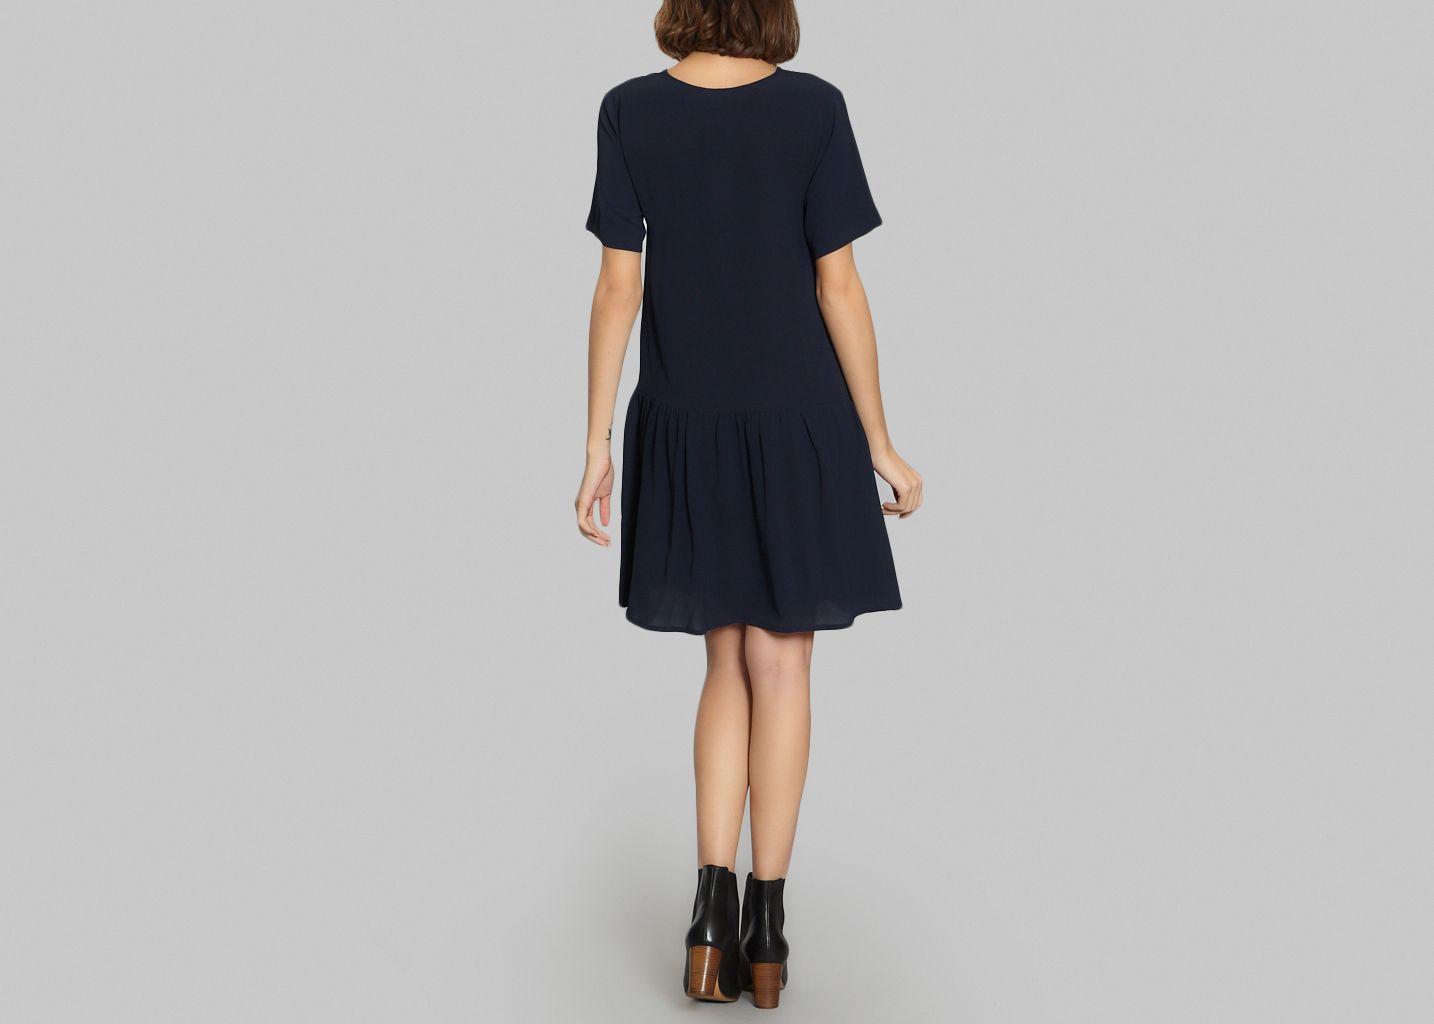 robe rosanna jolie jolie bleu marine l39exception With robe jolie jolie